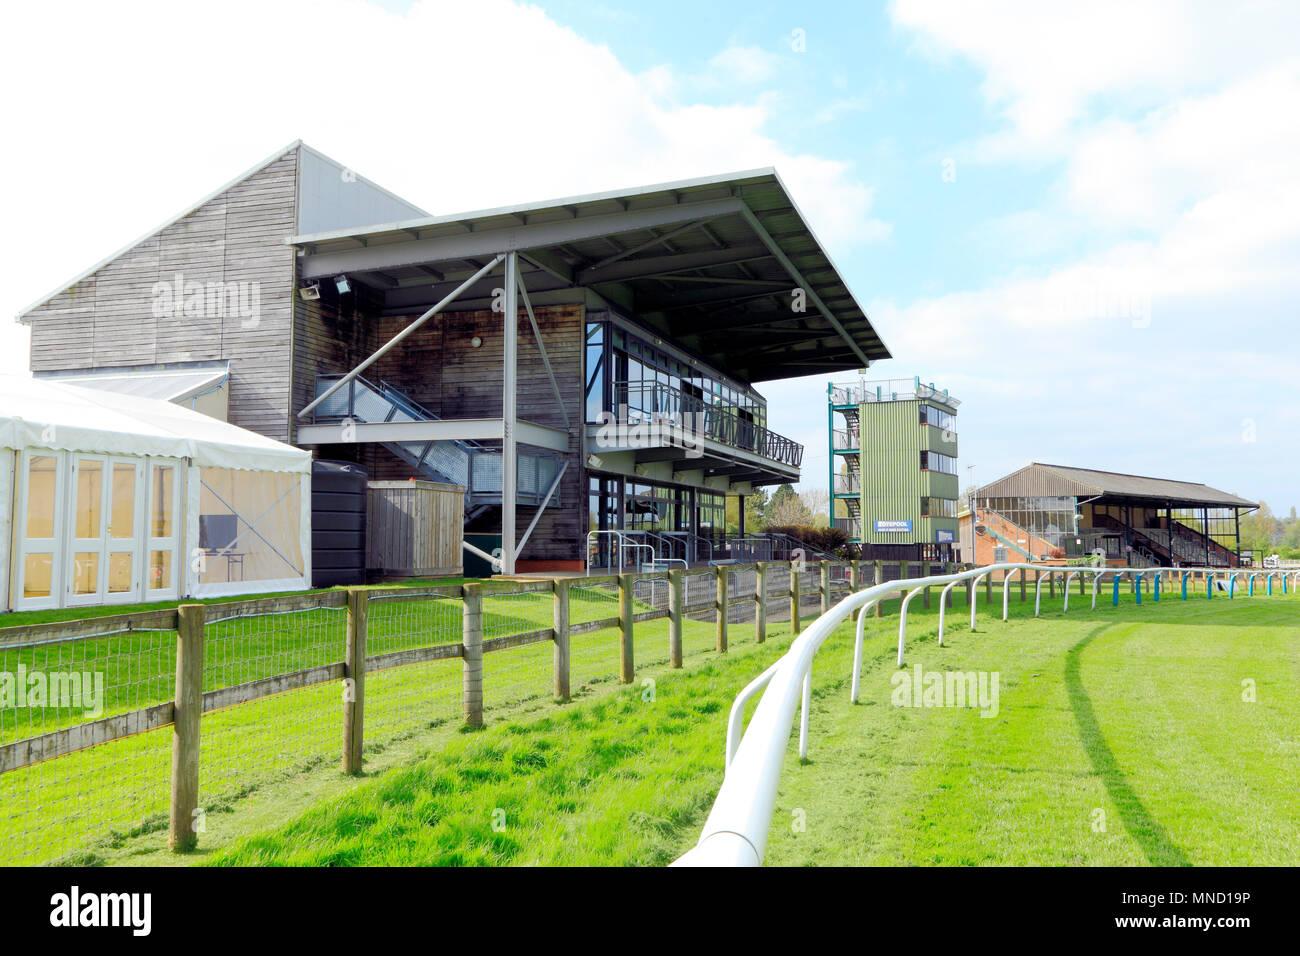 Fakenham Race Course, viewing area, grandstand, totepool, spectator enclosures, Norfolk, England, UK, horse racing, track, tracks, grandstands - Stock Image